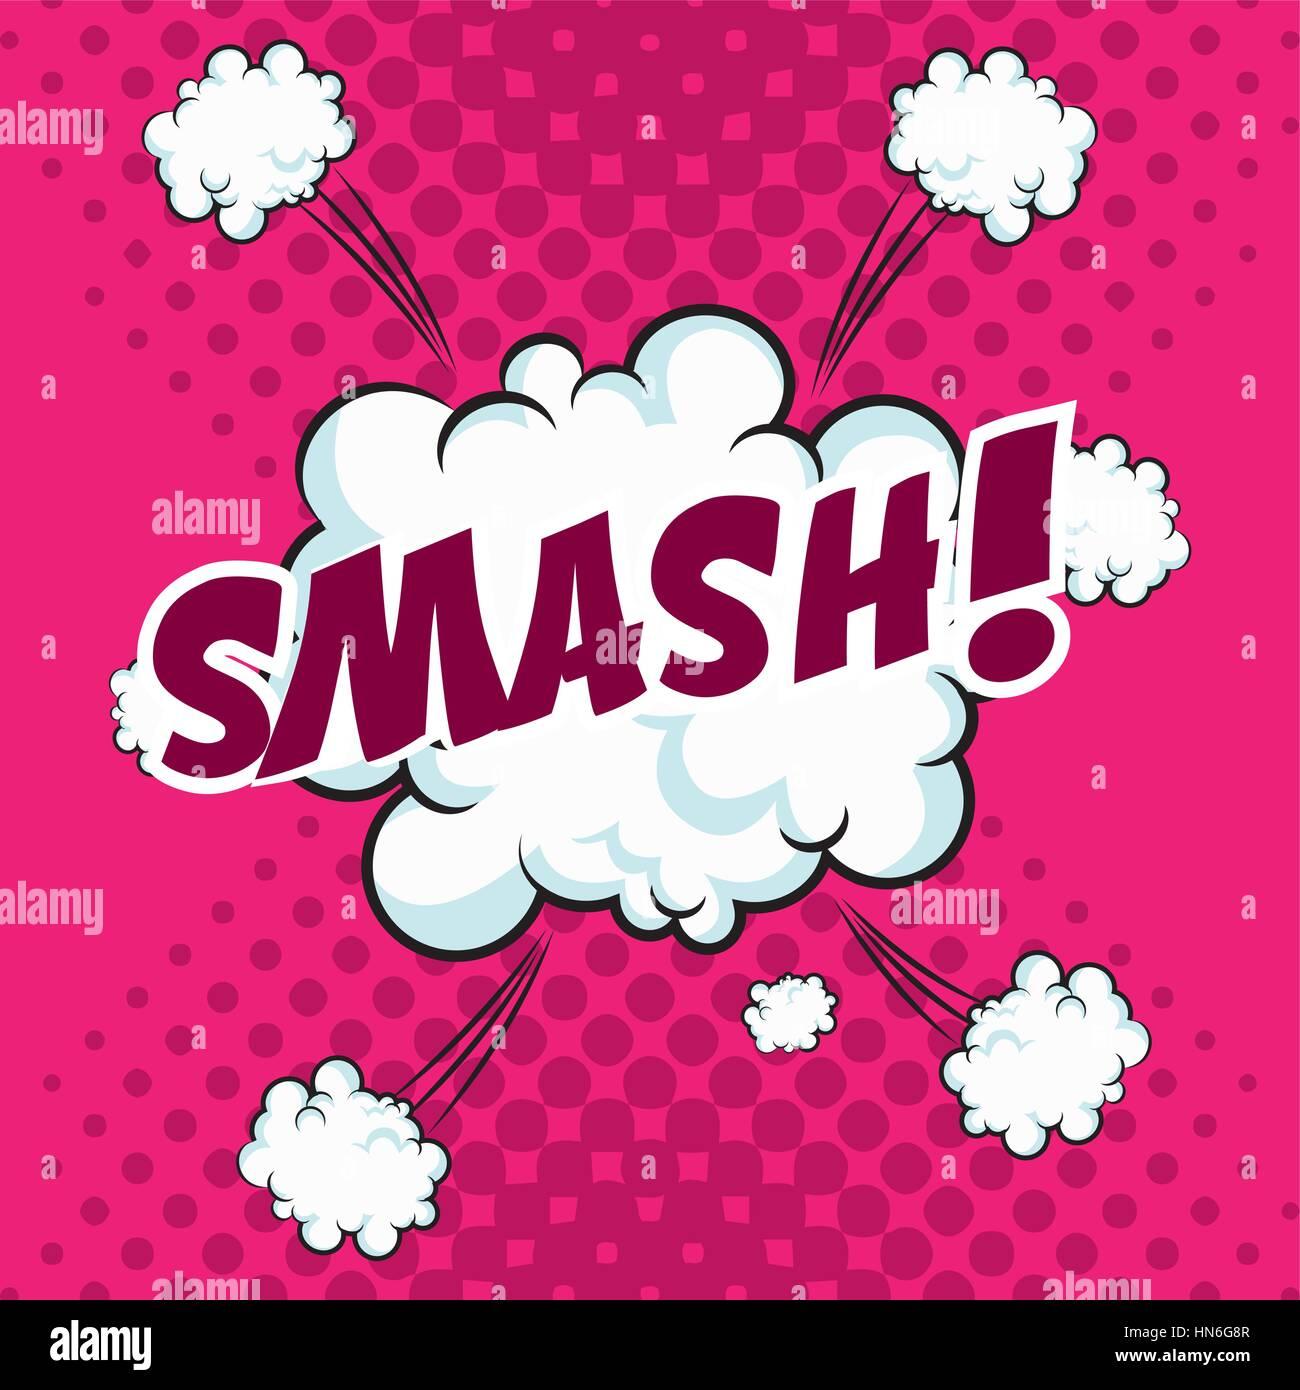 smash bubble speech pop art design stock vector art illustration